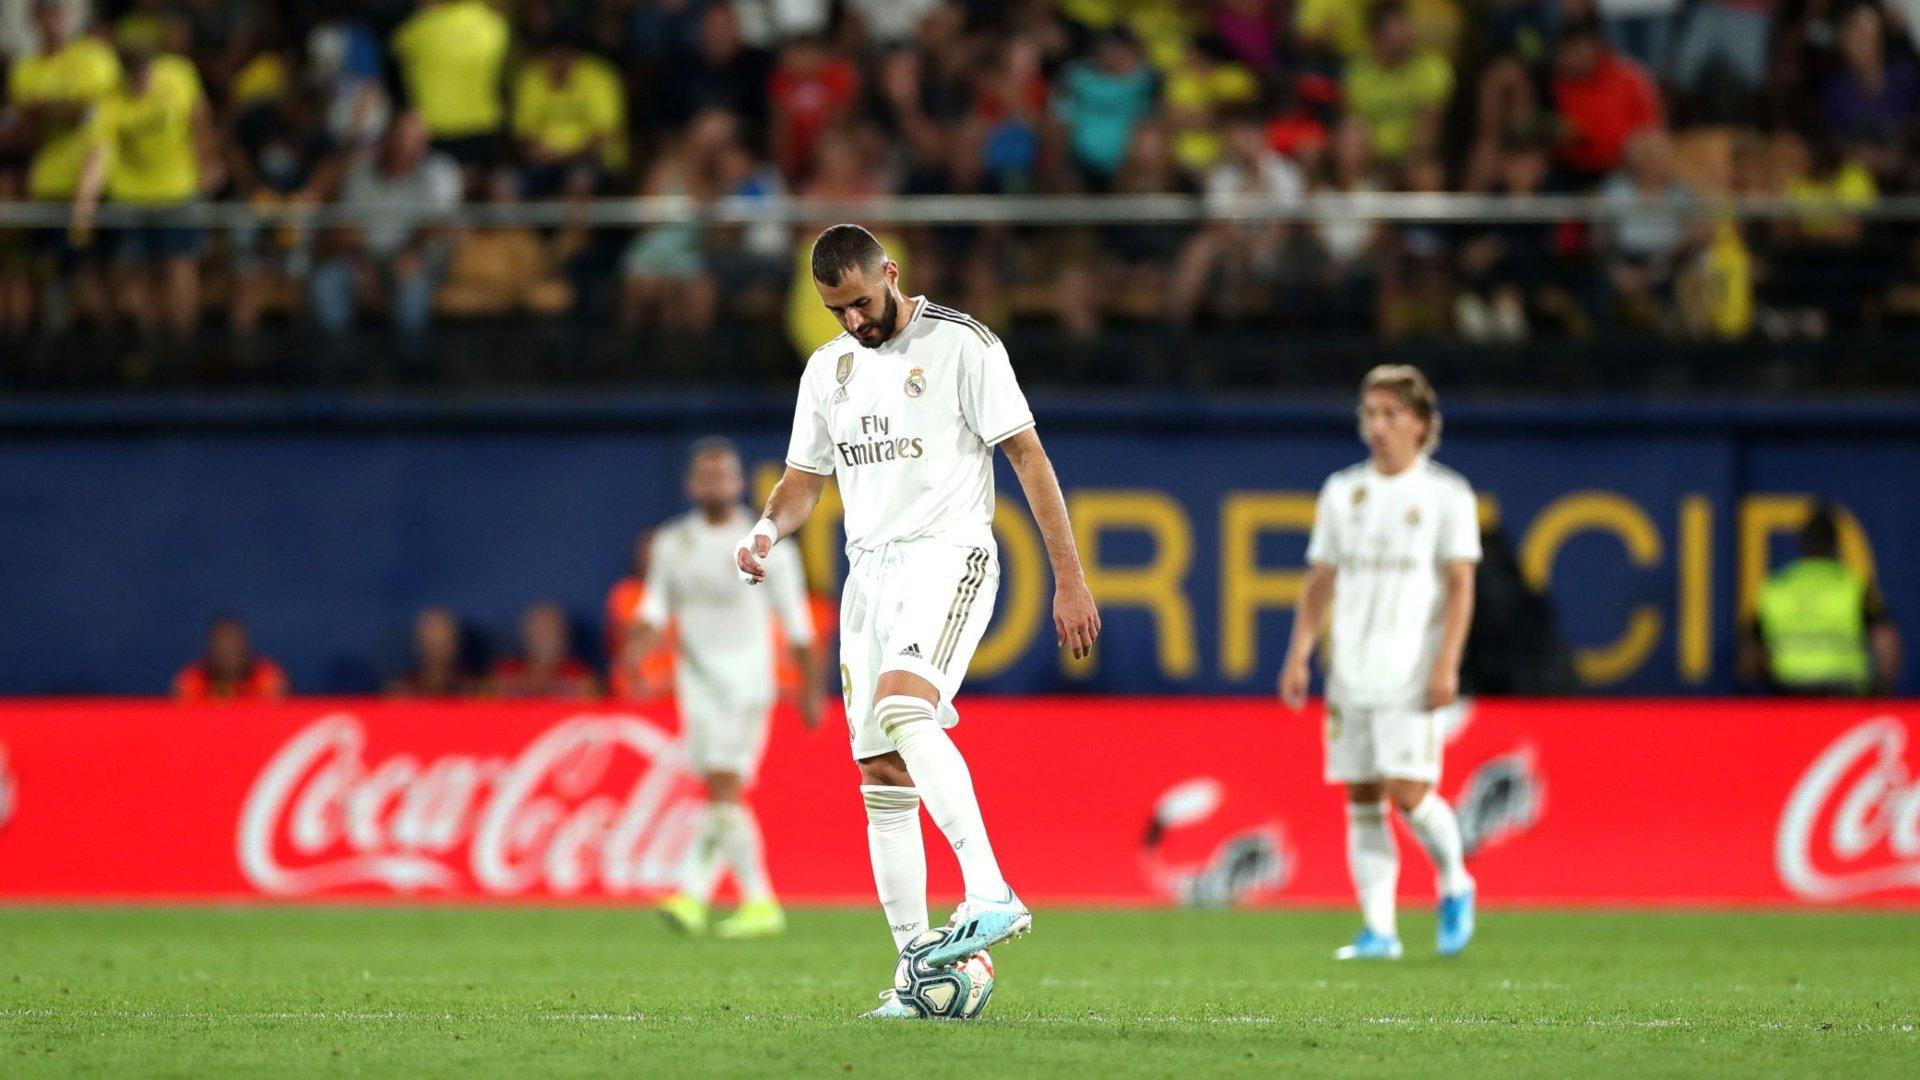 Match report: Villarreal 2-2 Real Madrid